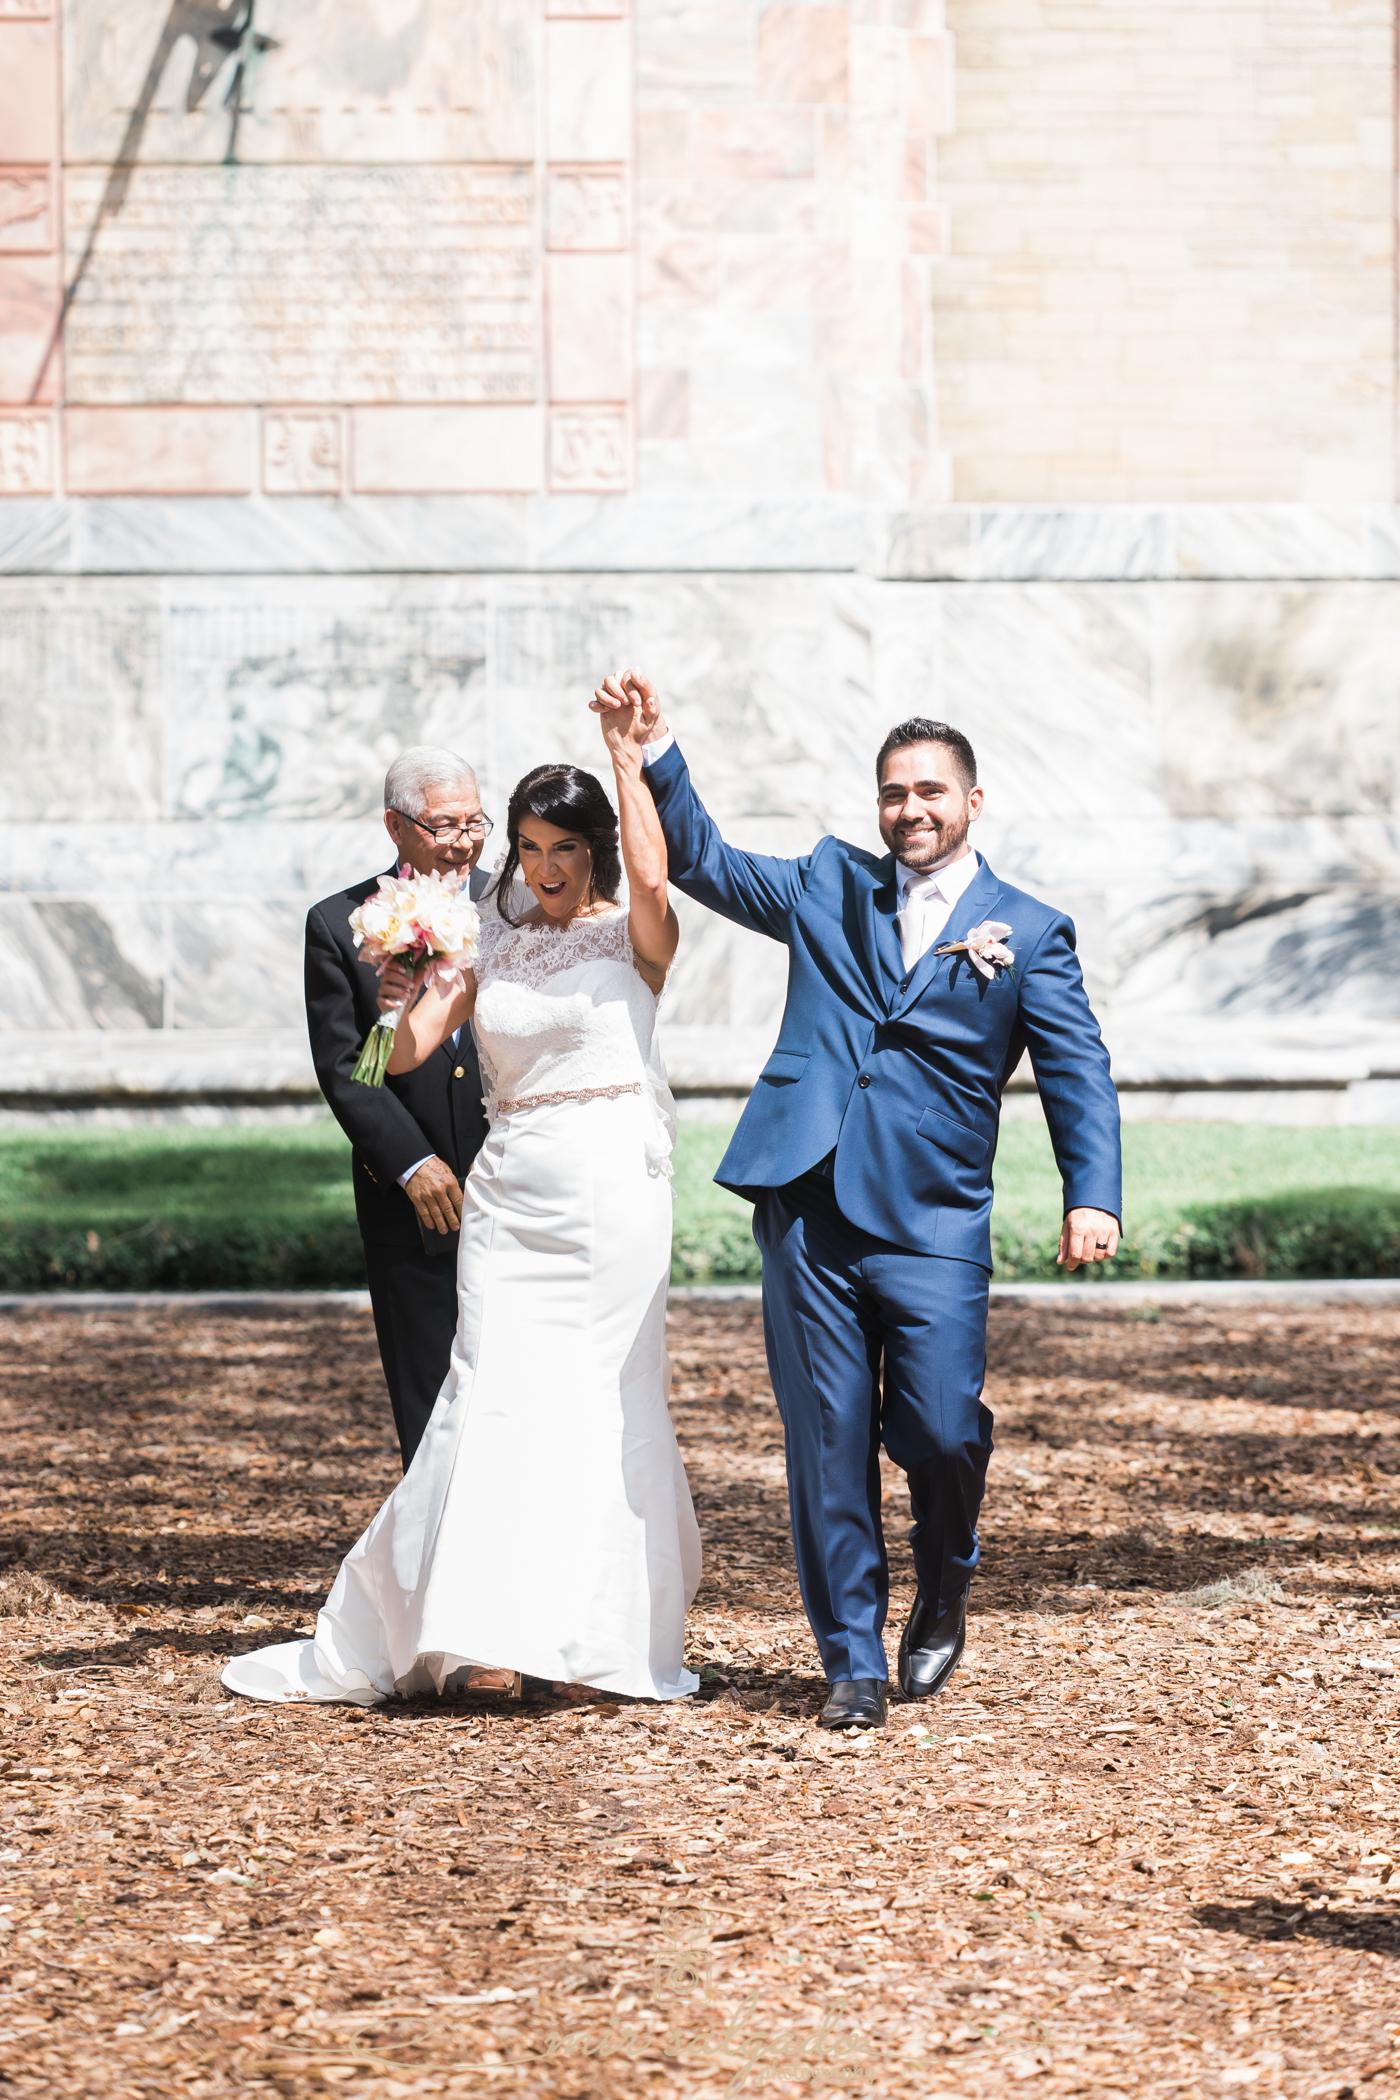 Bok-tower-gardens-wedding-ceremony-photo, Tampa-wedding-photographer, just-married-photo